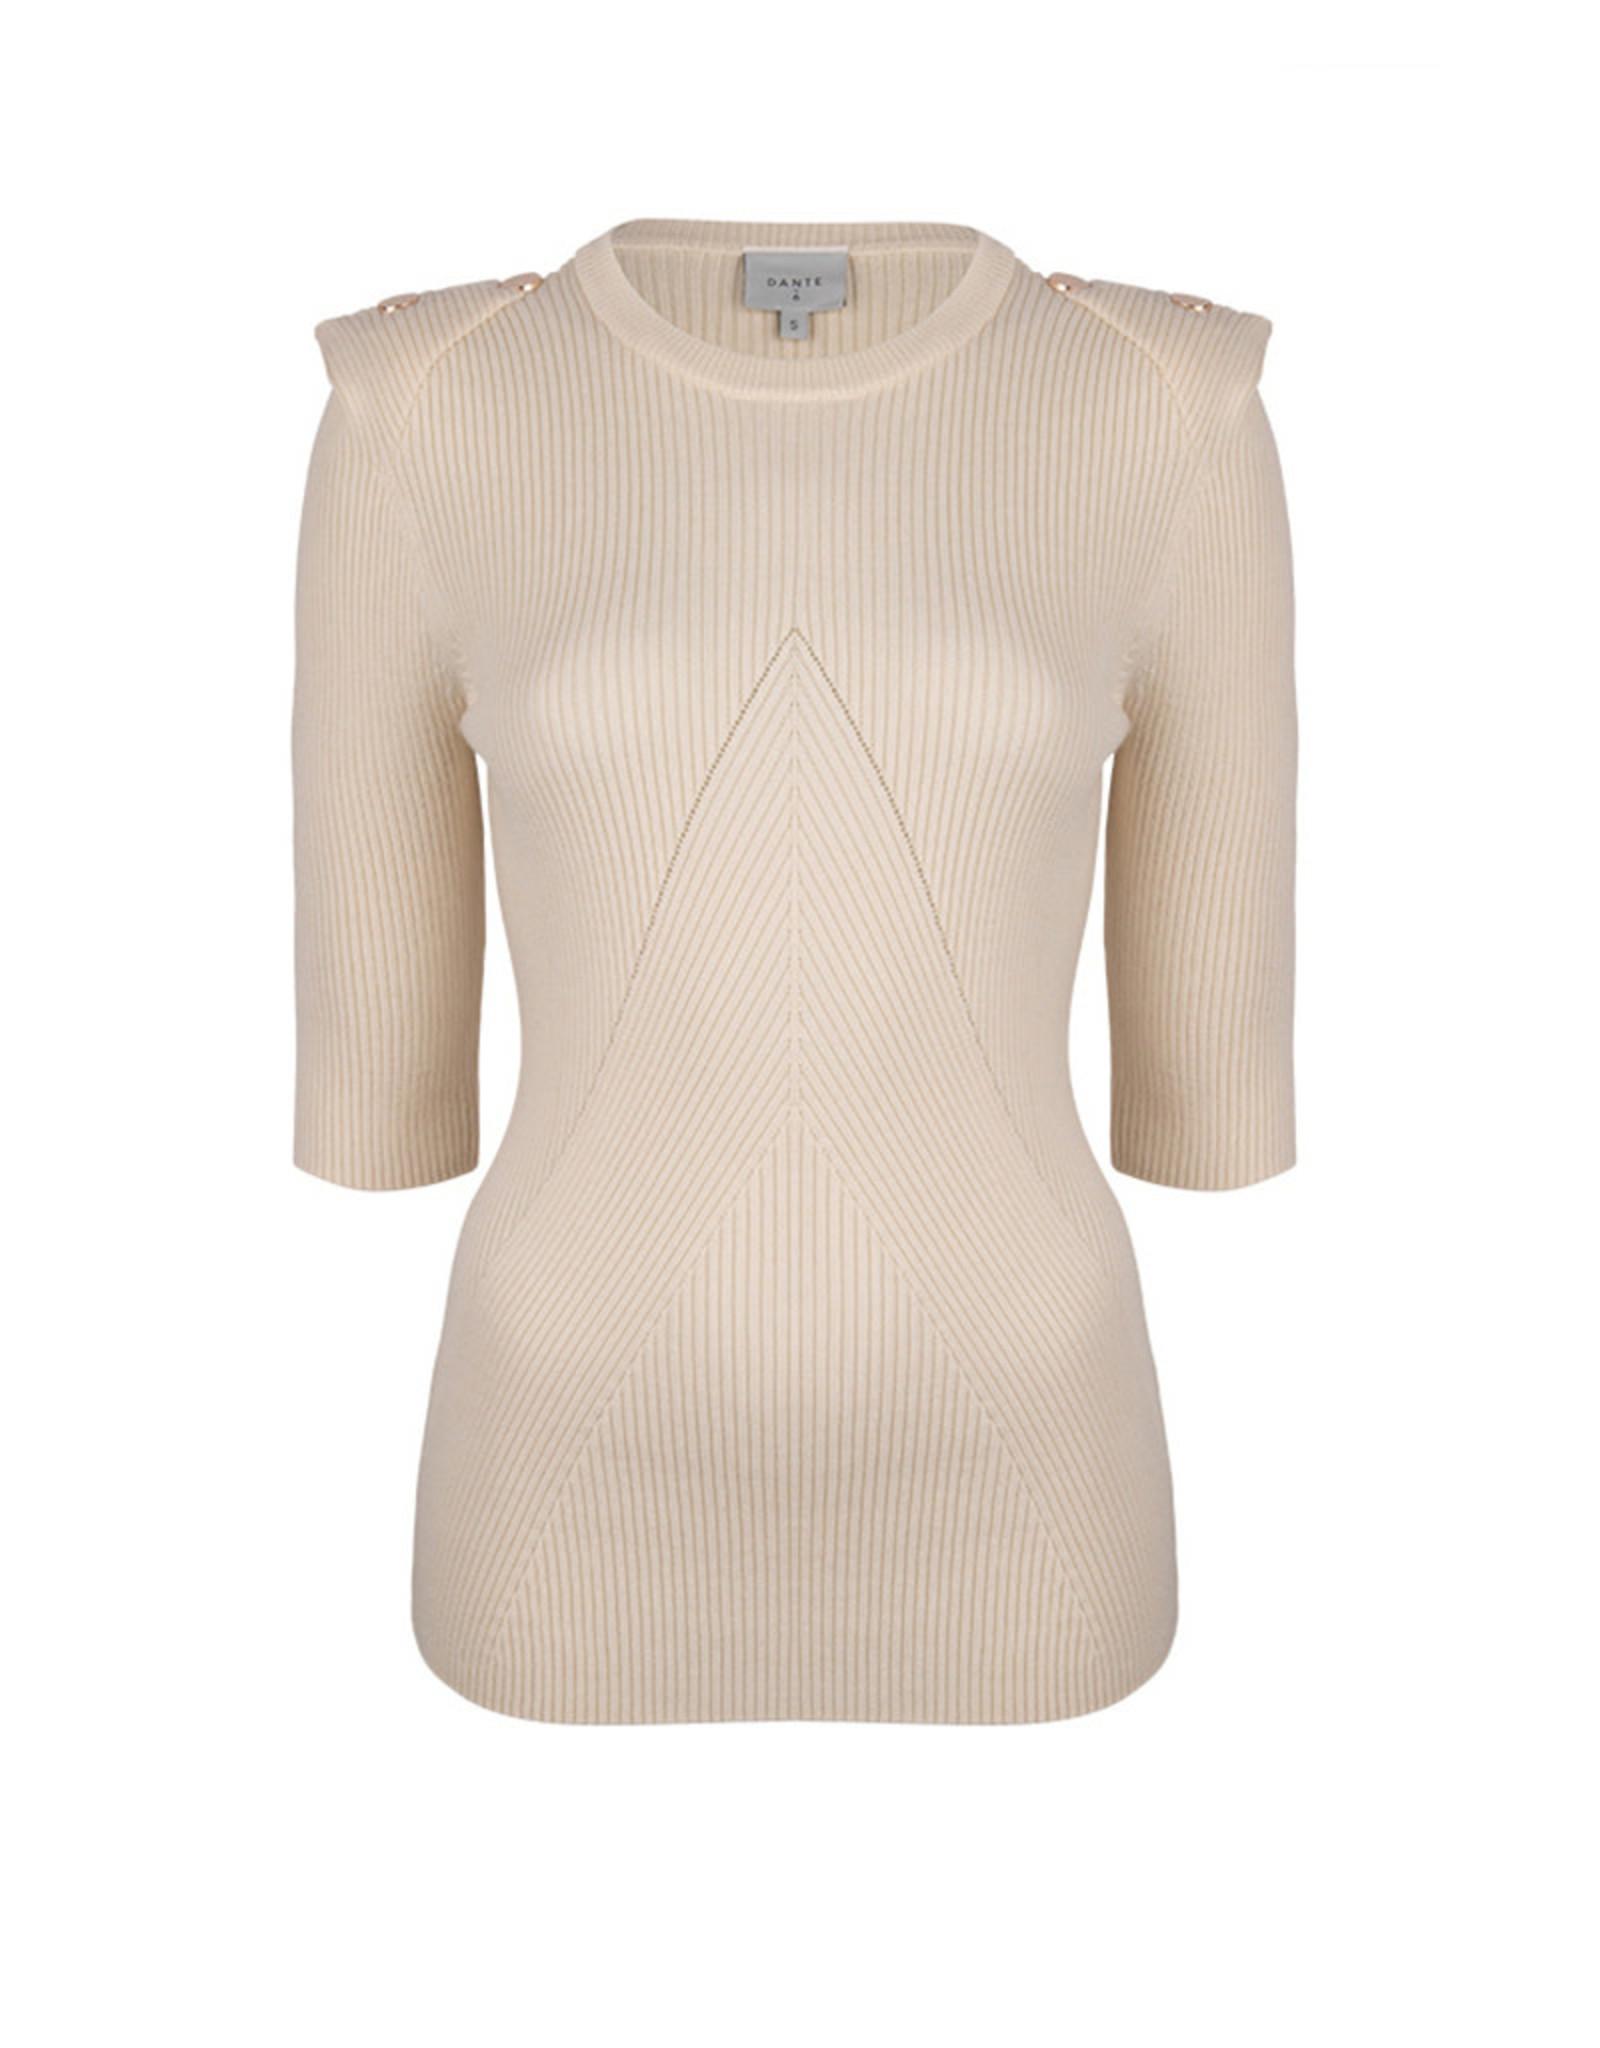 dante6 Sephine Sweater